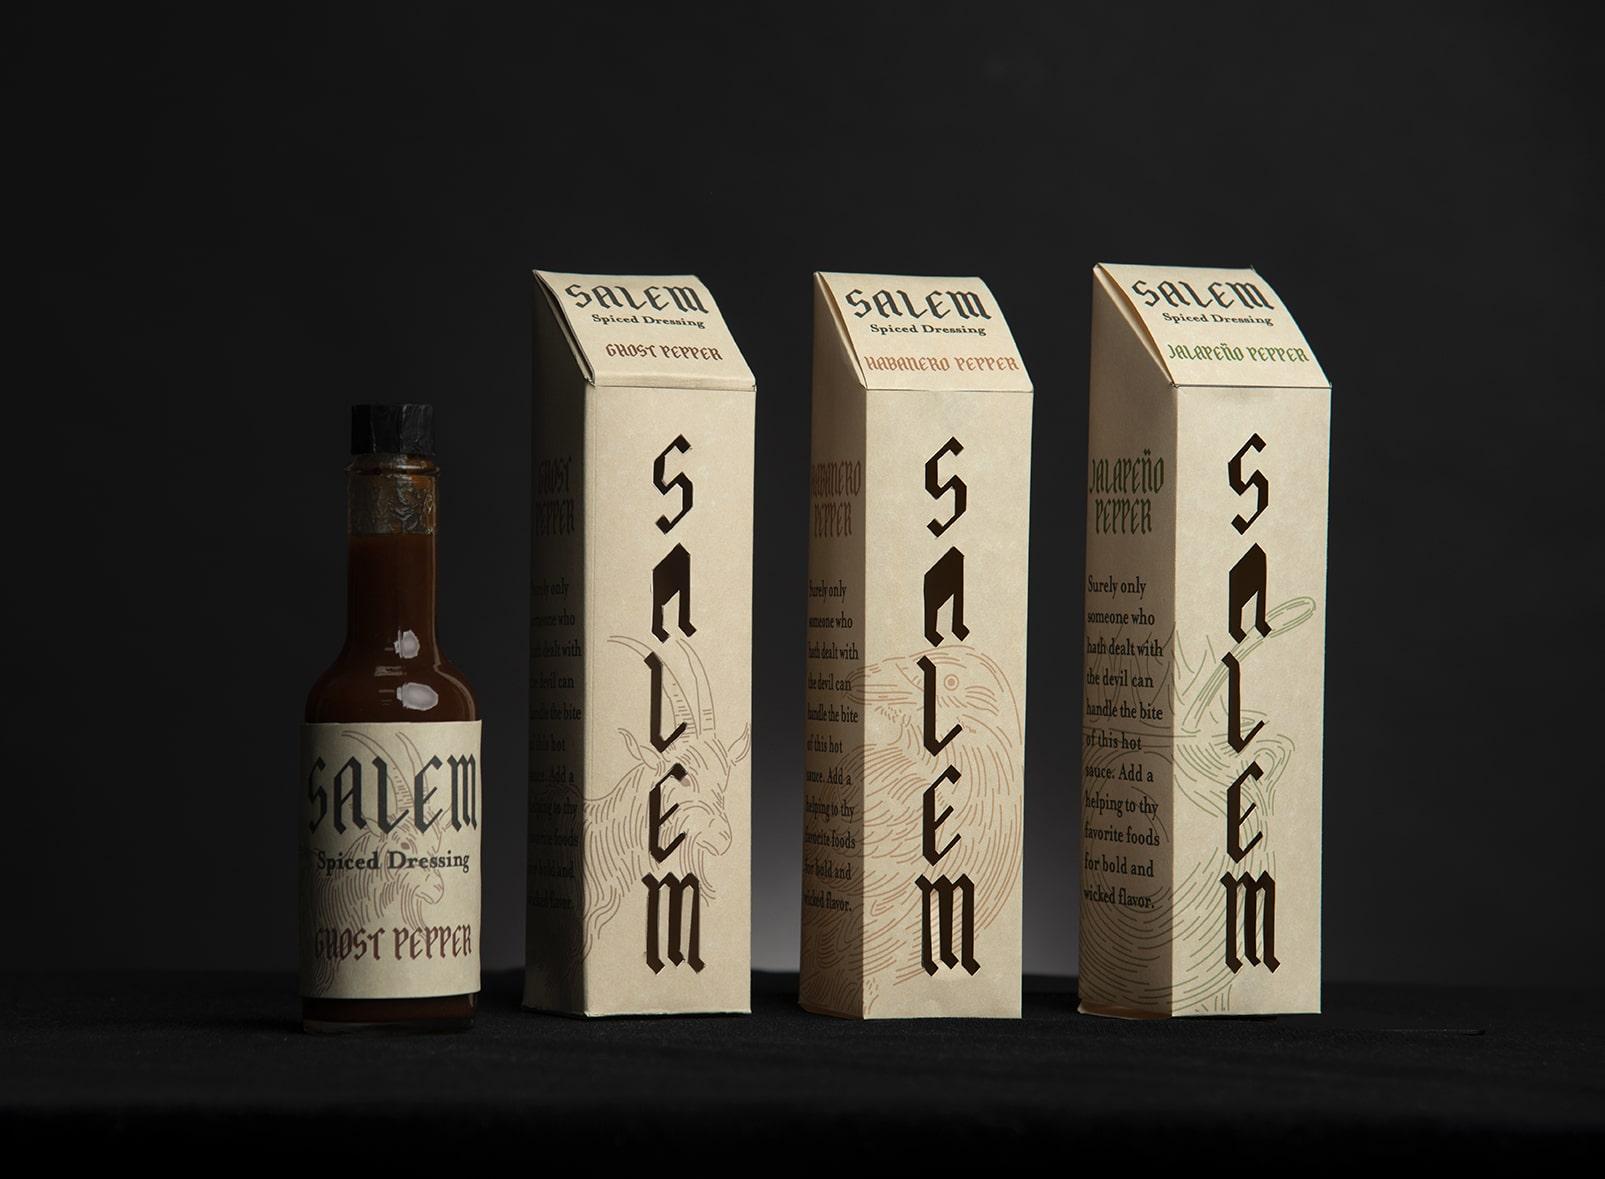 Matt Hennessey Design - Salem Spiced Dressing1.jpg